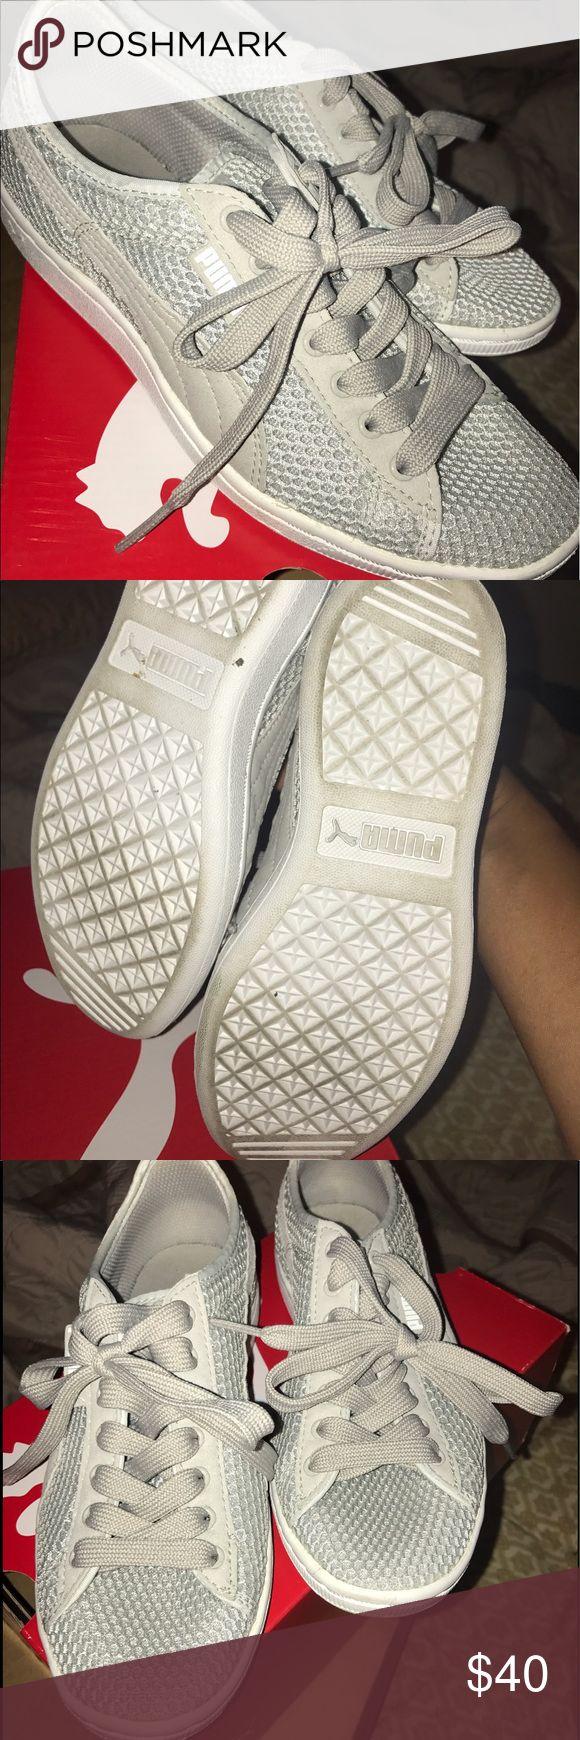 Woman's puma sneakers Worn twice woman's puma sneakers Puma Shoes Sneakers